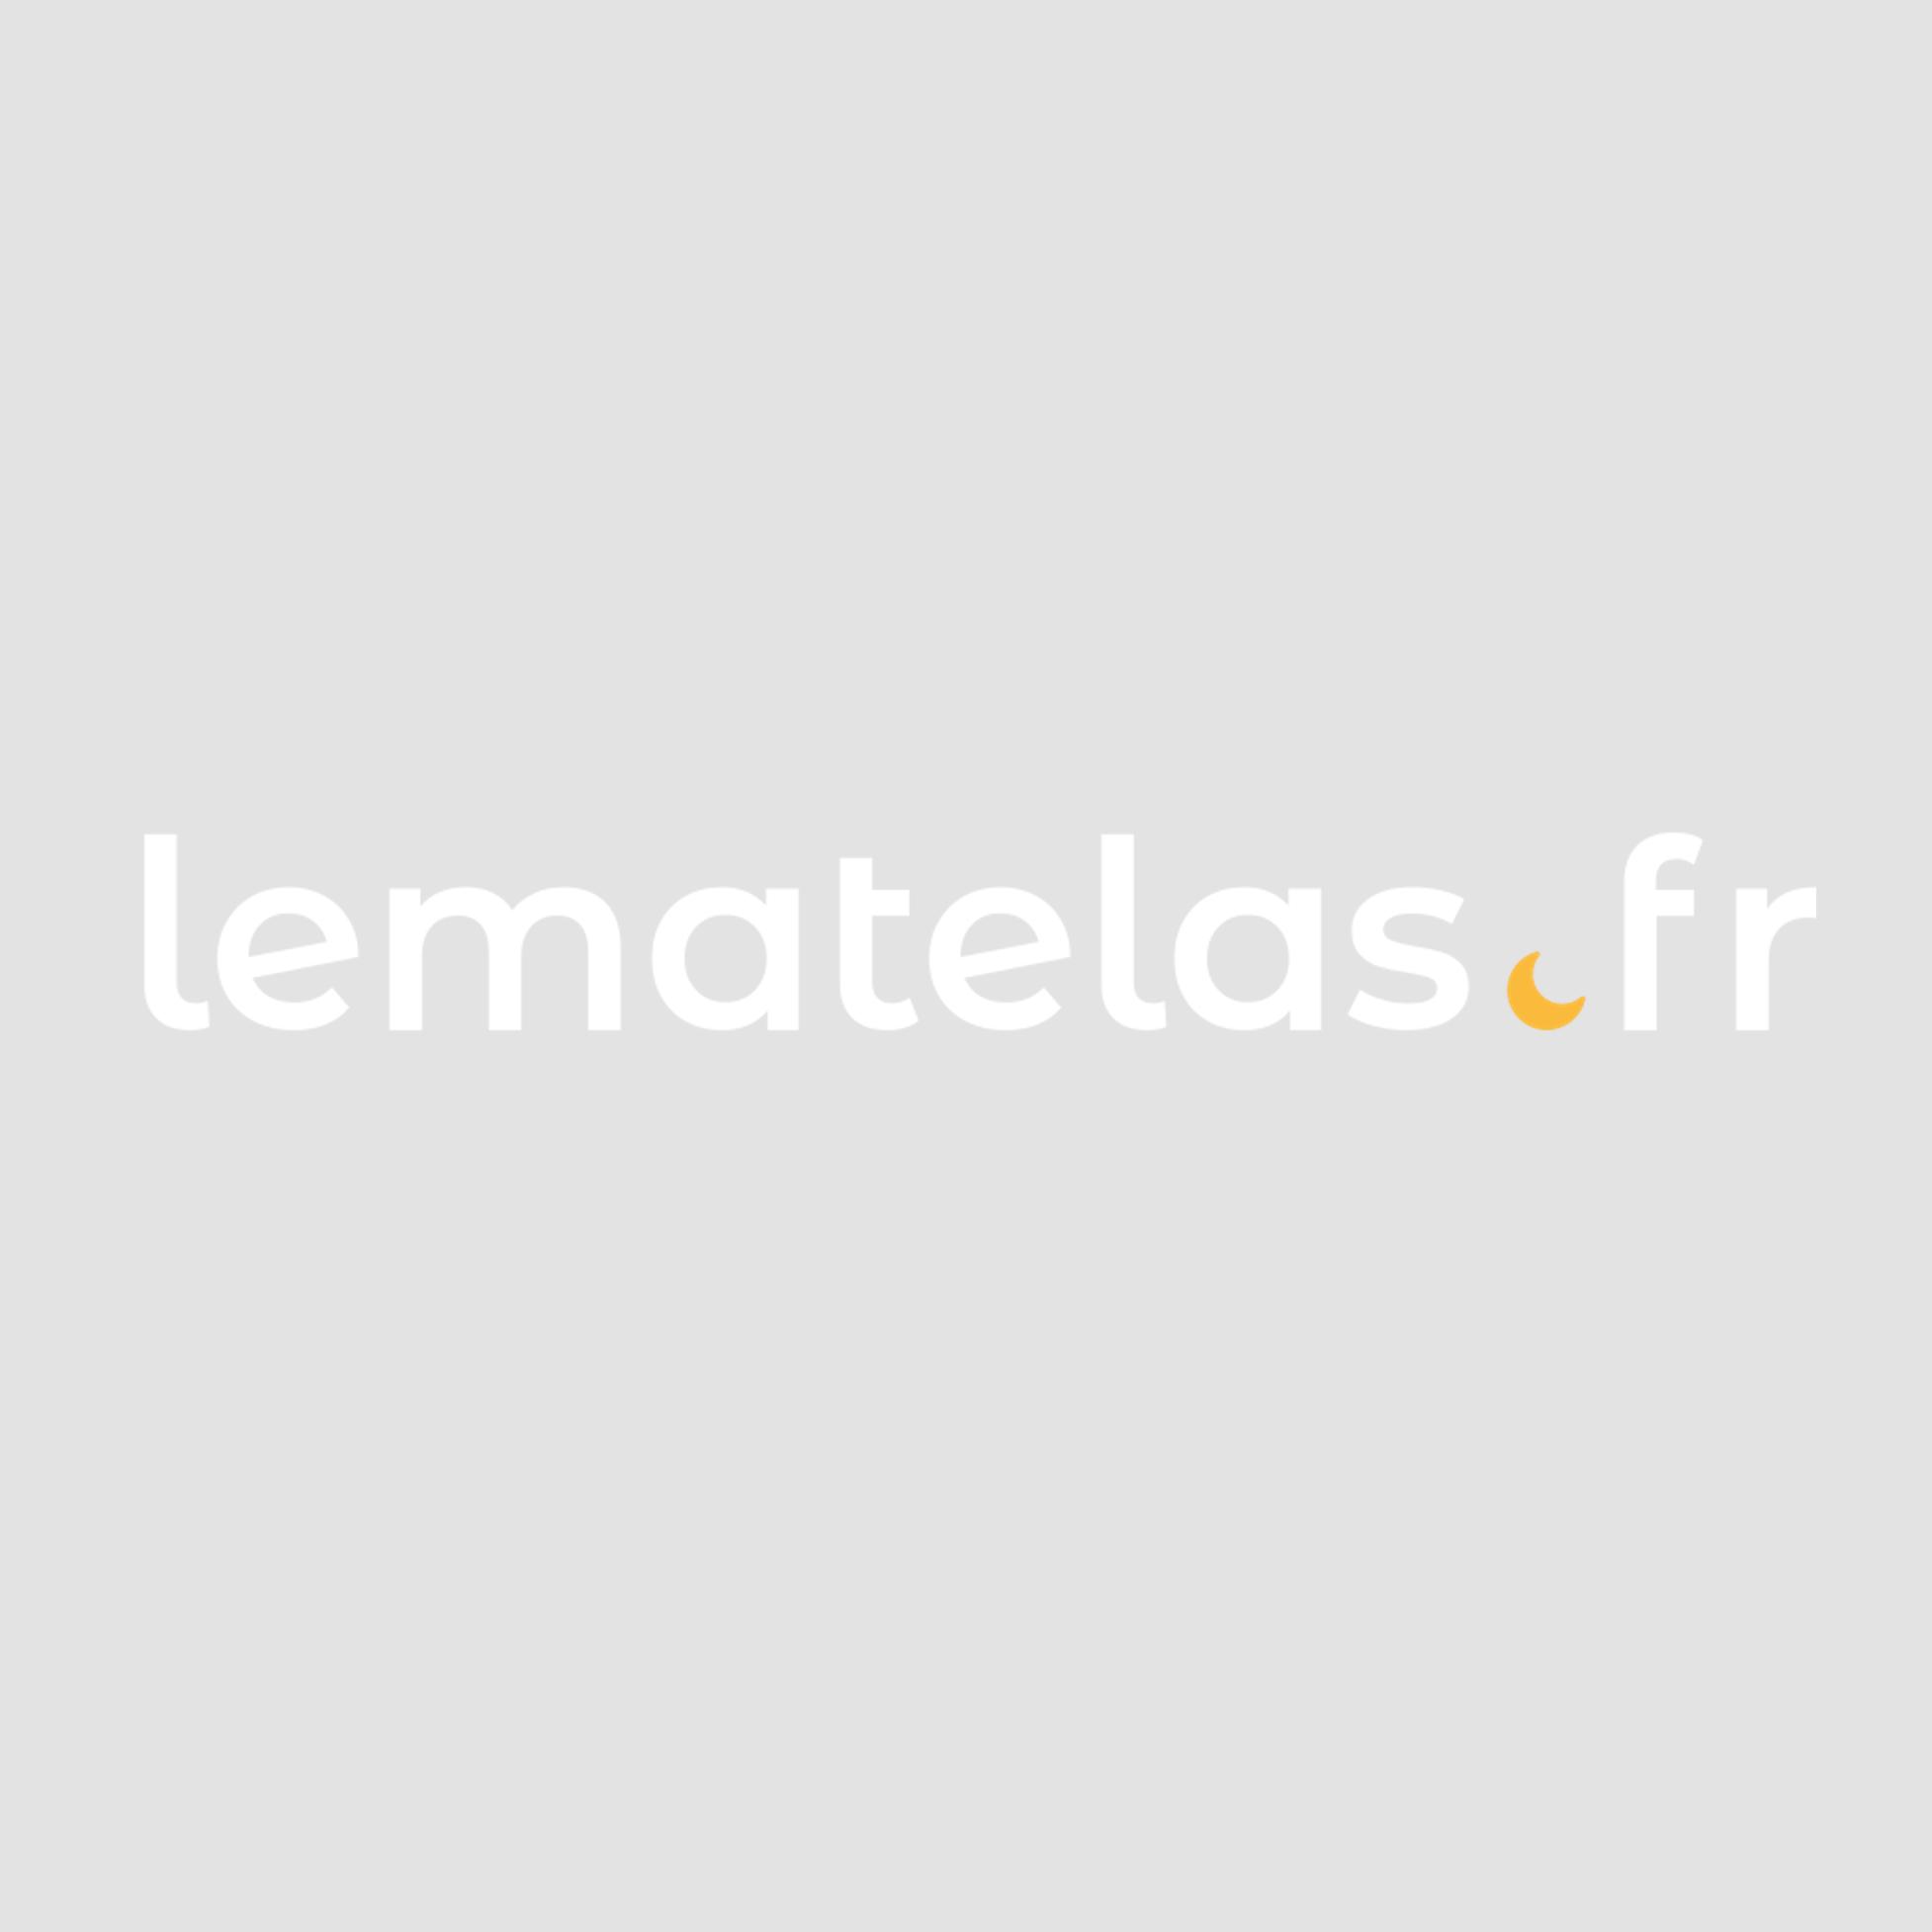 Someo Lot de 2 oreillers luxe enveloppe percale anti-acariens SOMEO 65x65